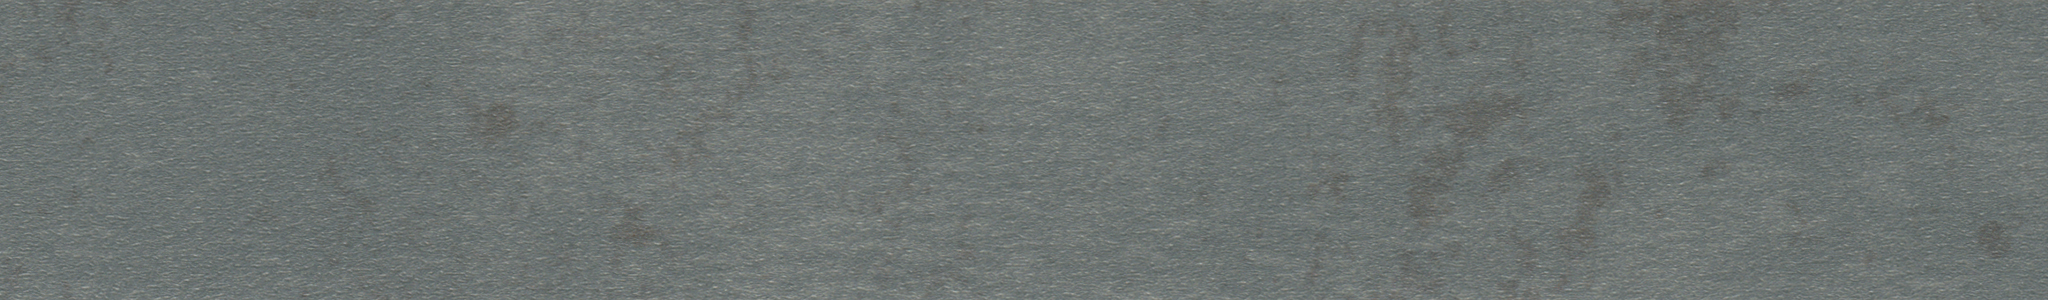 HD 296006 ABS Kante Dekor Stahl geglüht perl